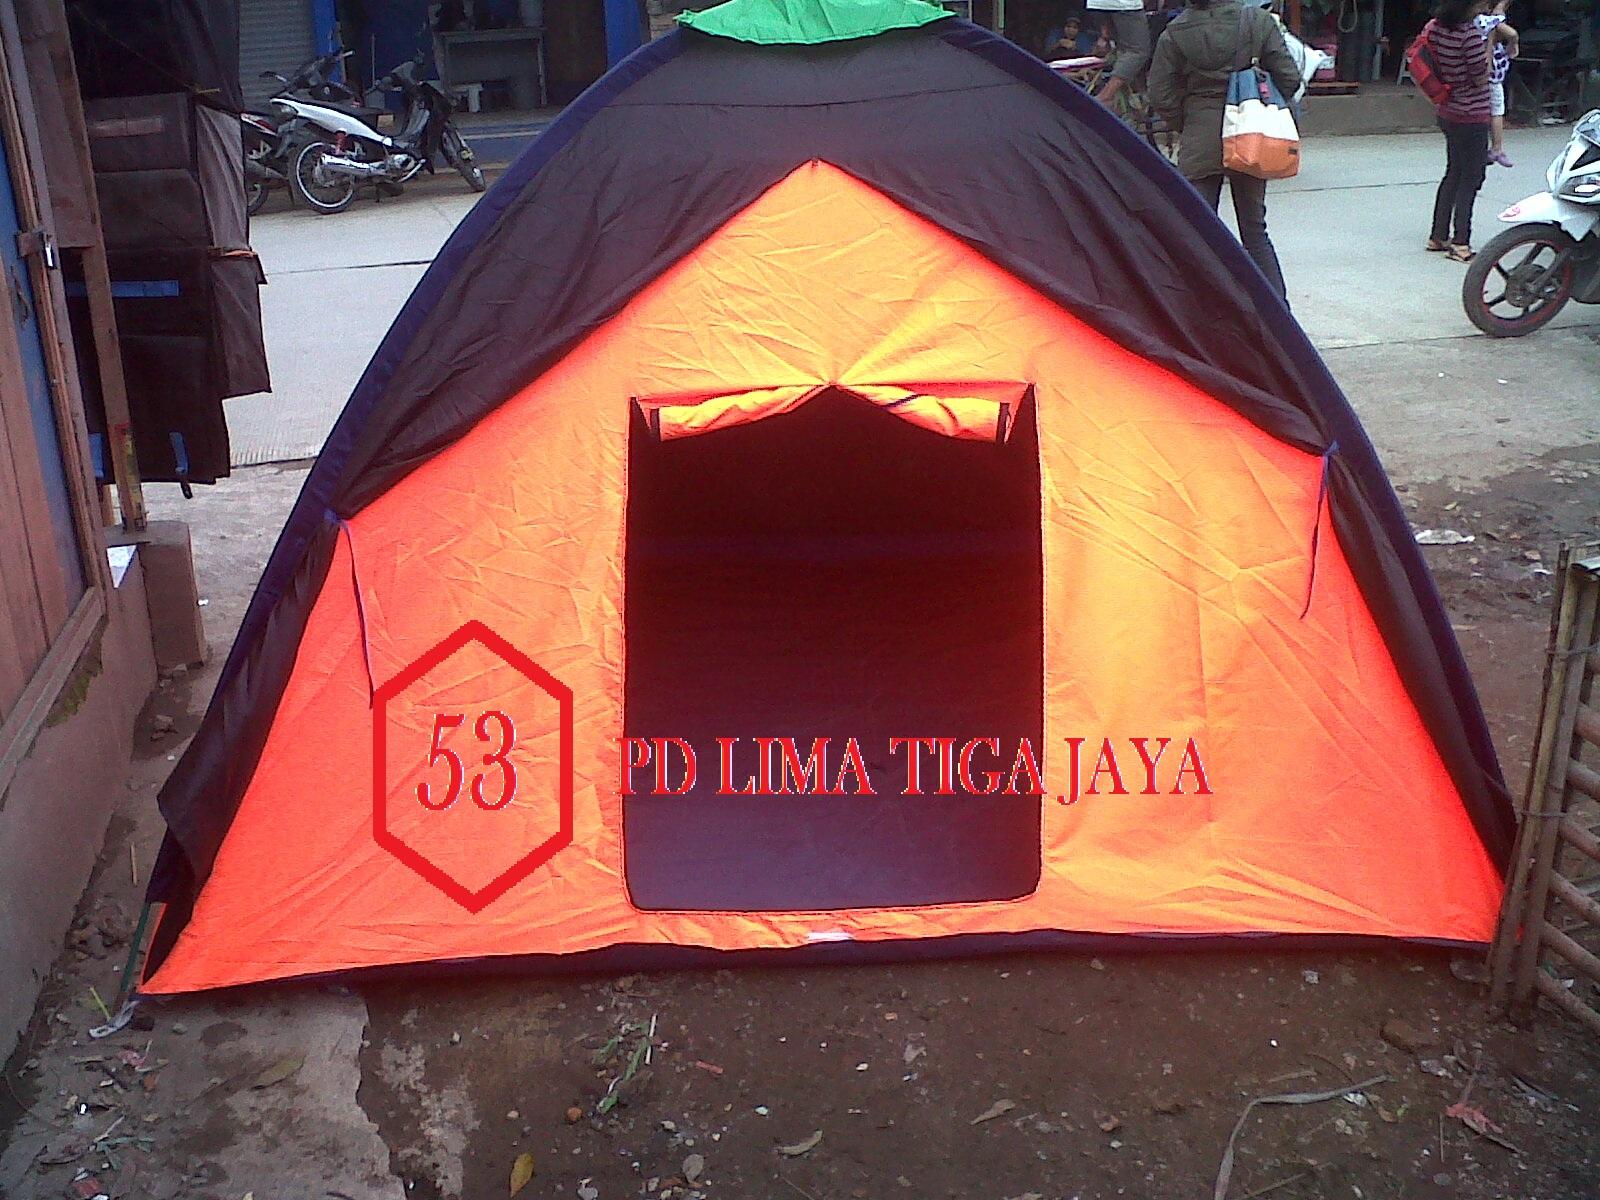 jual tenda dome , doom , murah , bandung